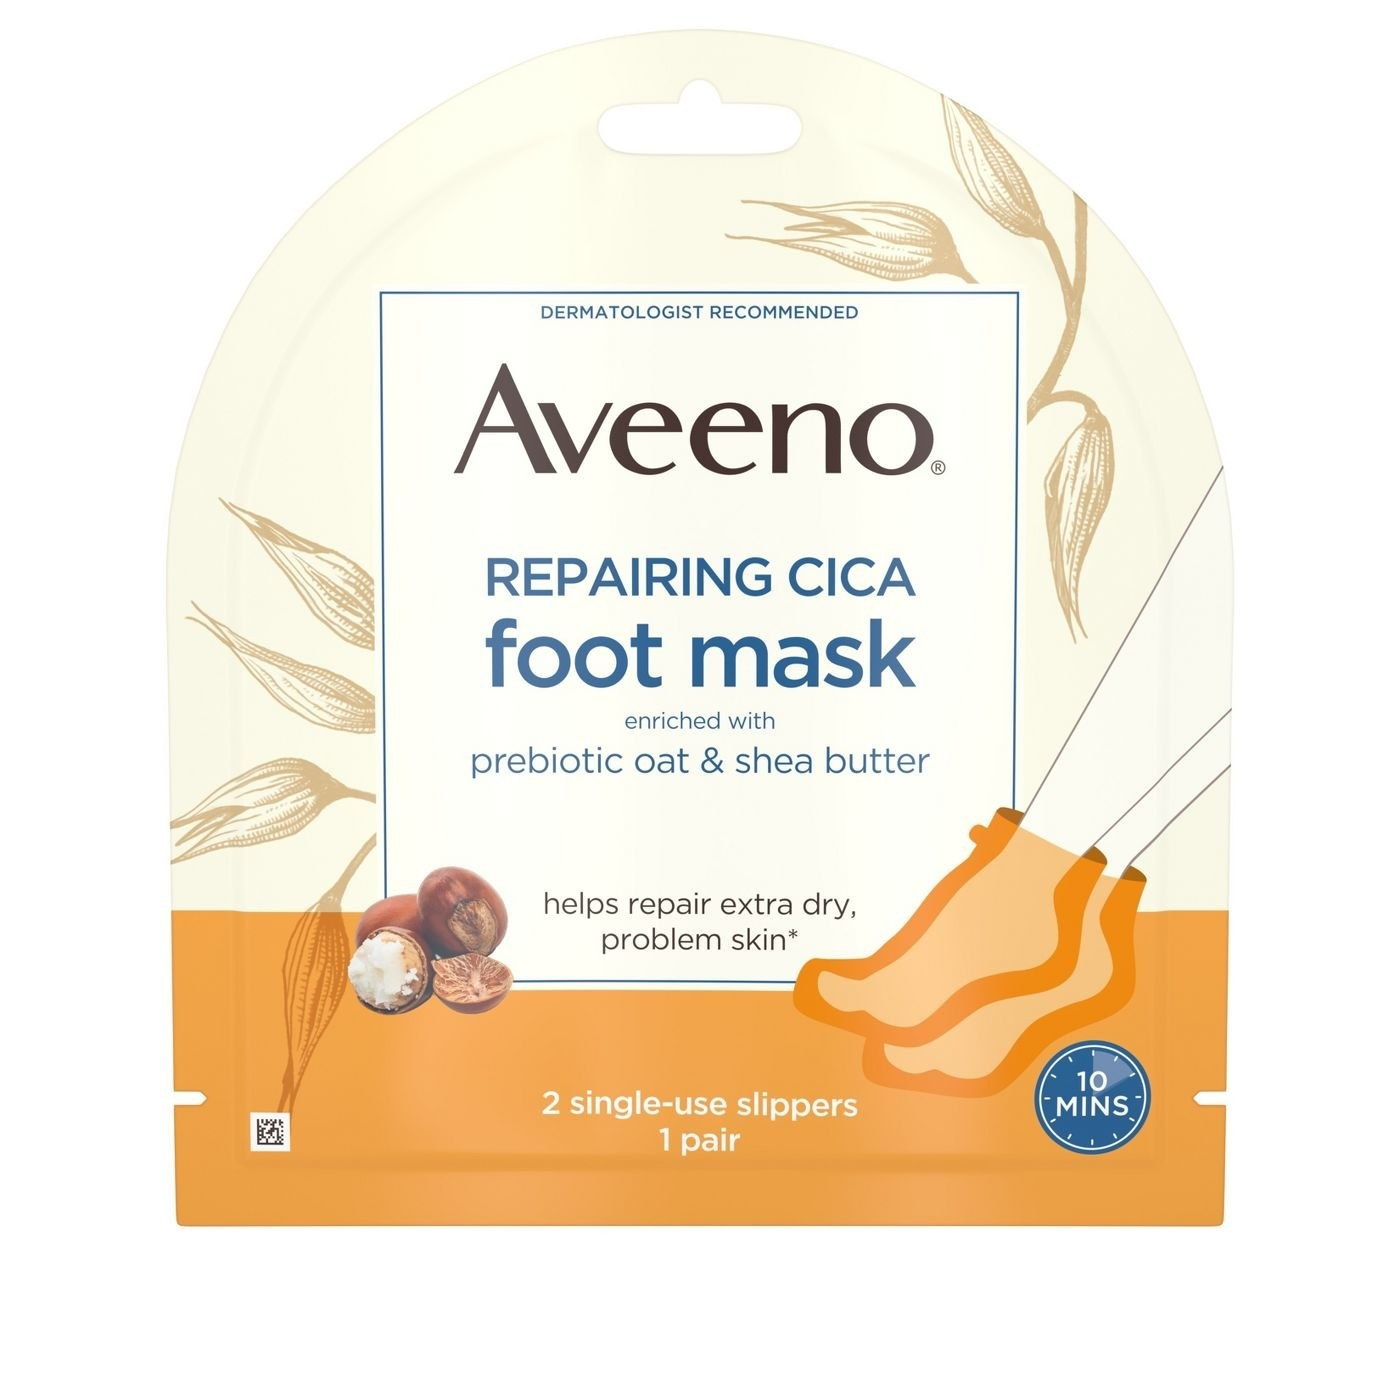 The aveeno repairing cica foot mask